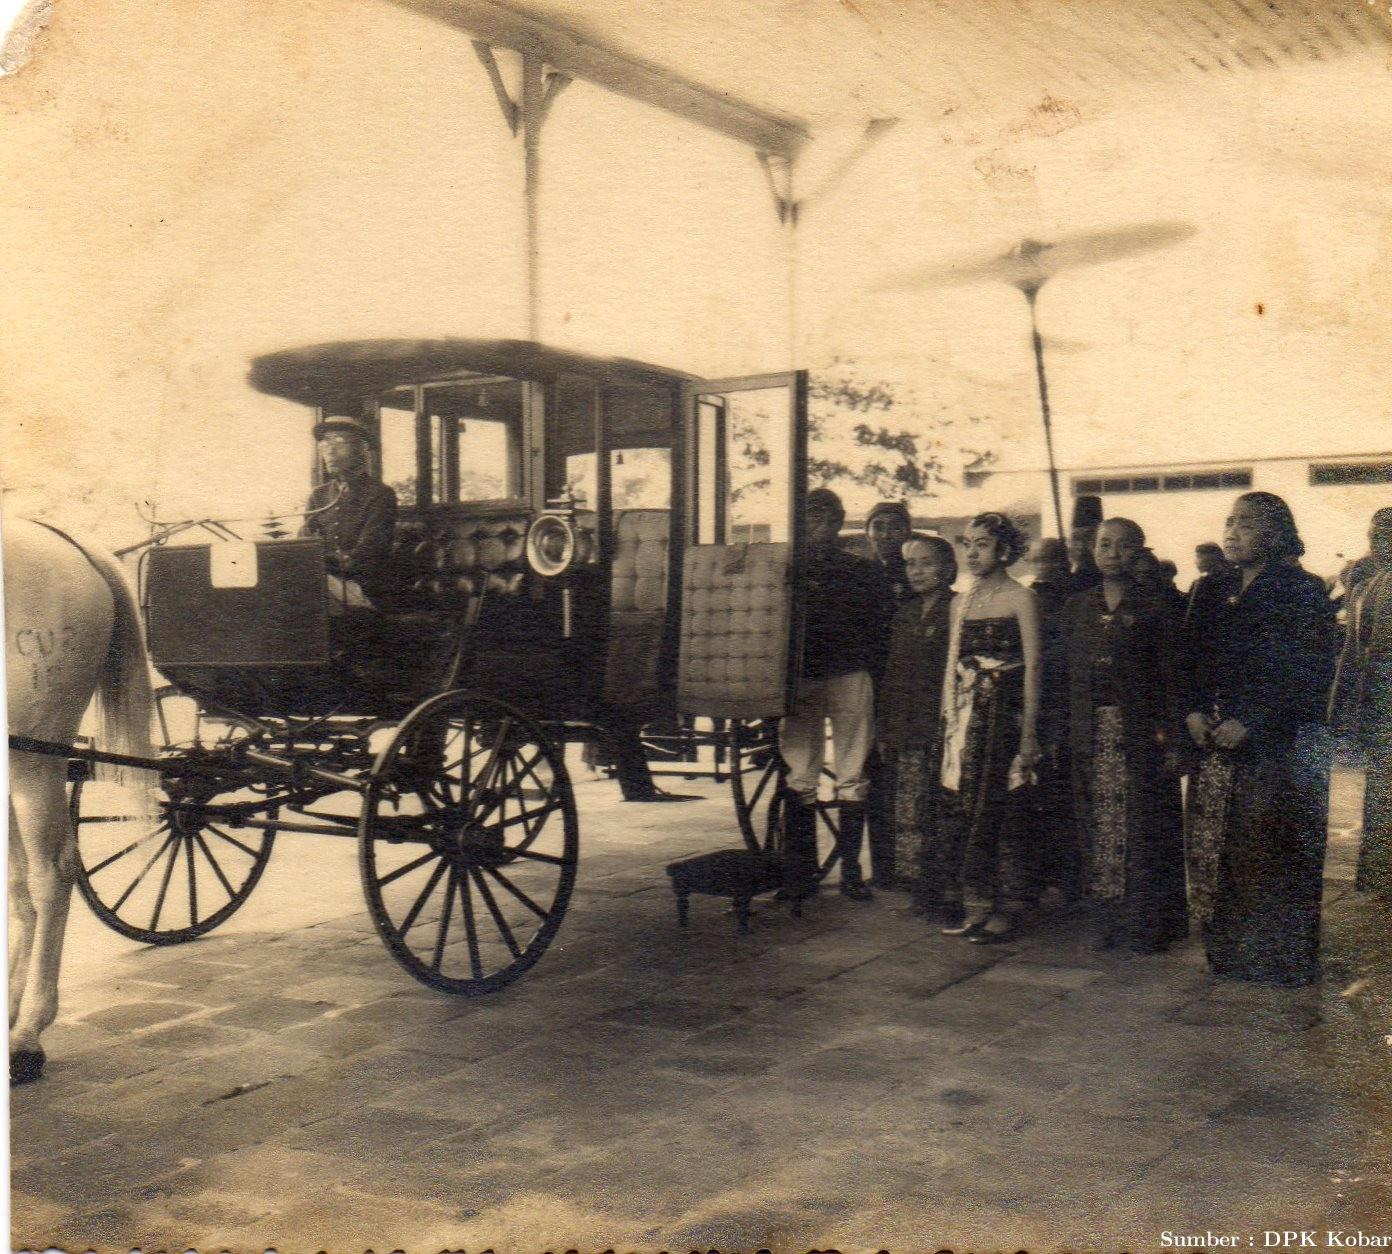 Pernikahan, Permaisuri Sultan XIV sedang menaiki kereta kencana di Solo, tahun 1942.